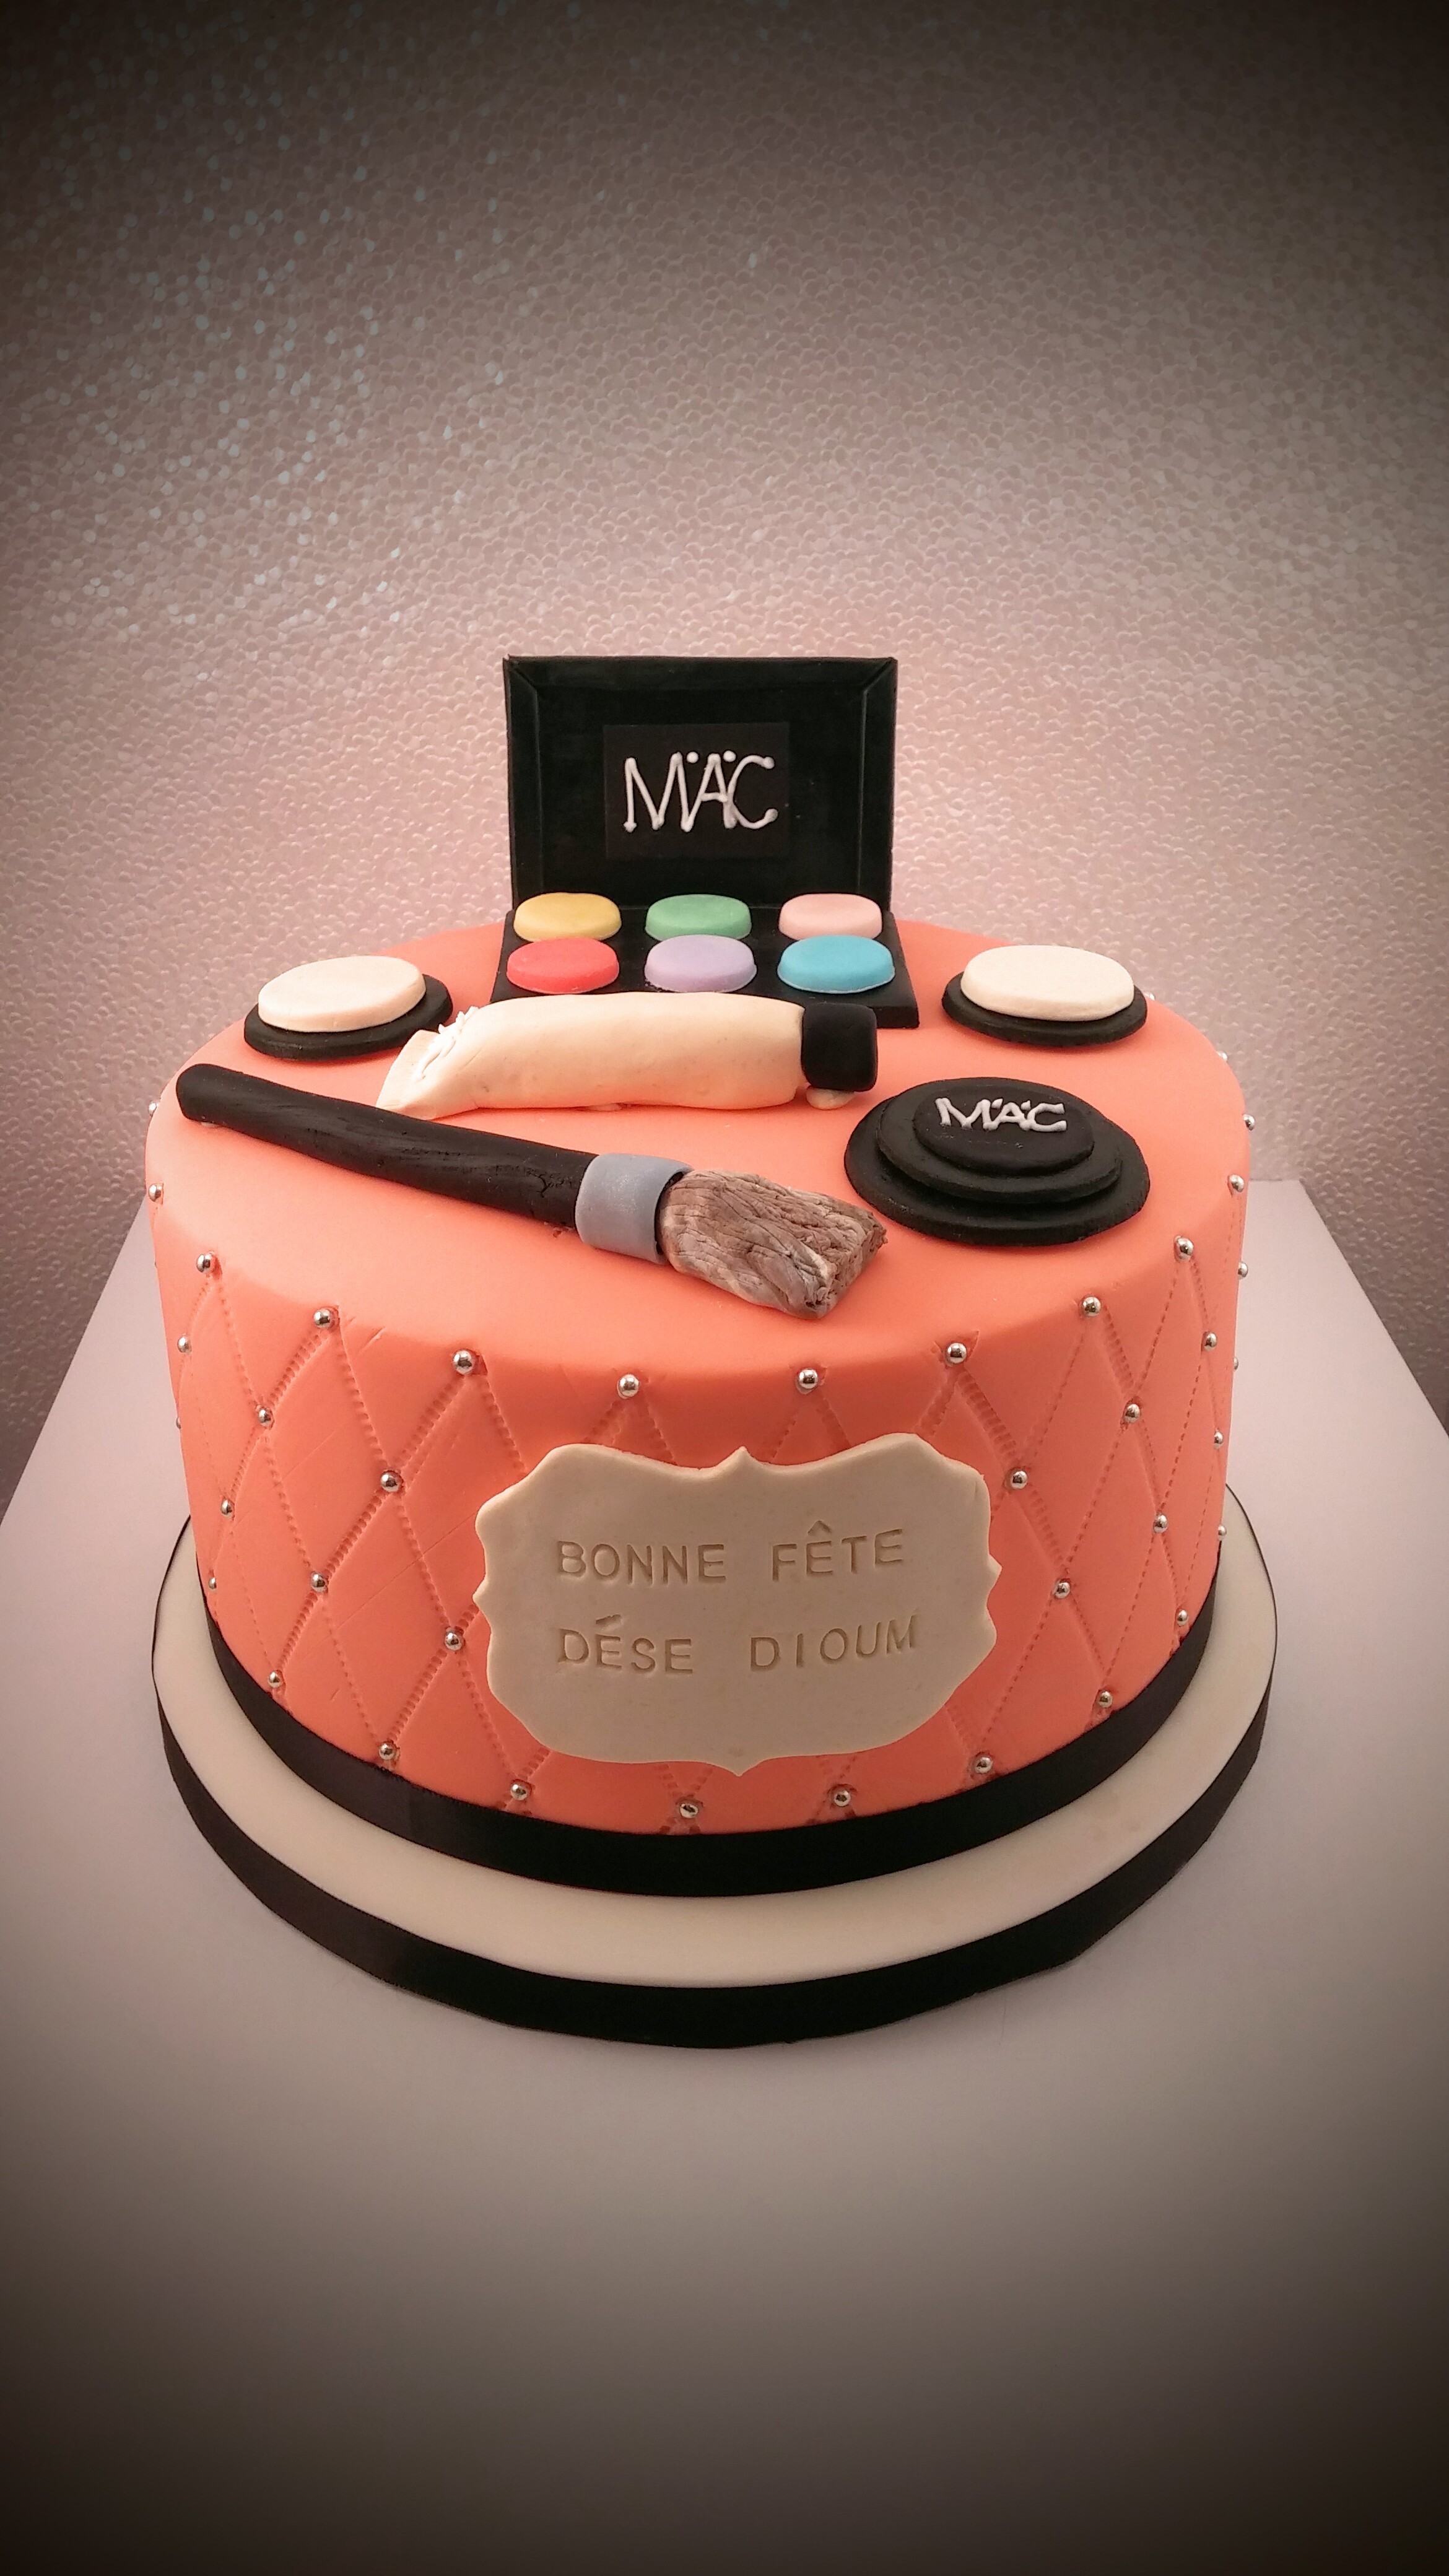 Make-up/ Fashion Cake